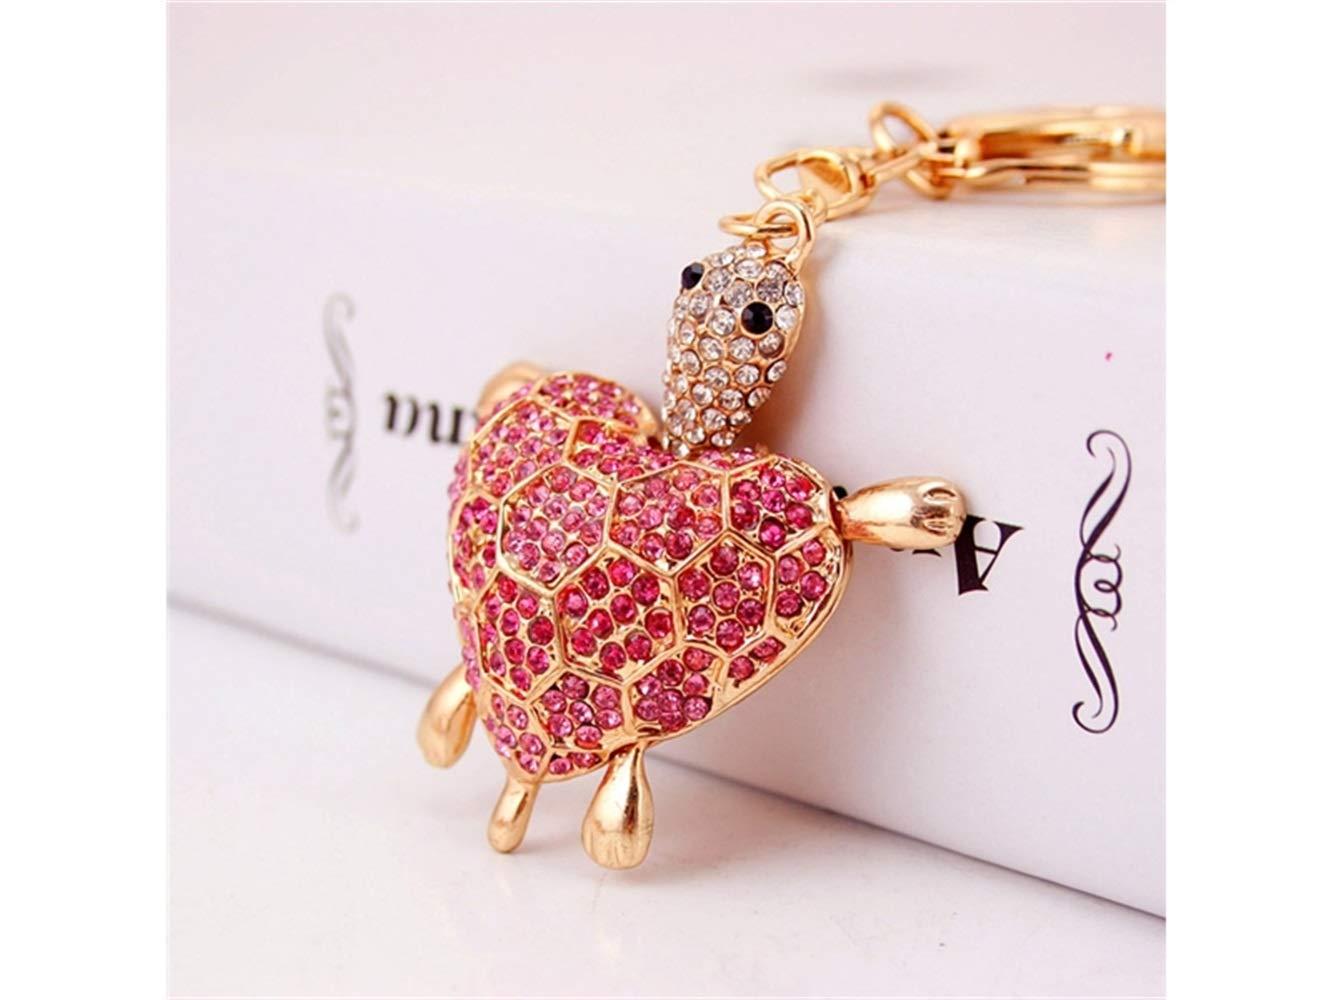 Car Keychain, Cute Diamond Love Back Shell Turtle Keychain Animal Key Trinket Car Bag Key Holder Decorations(Pink) for Gift by Huasen